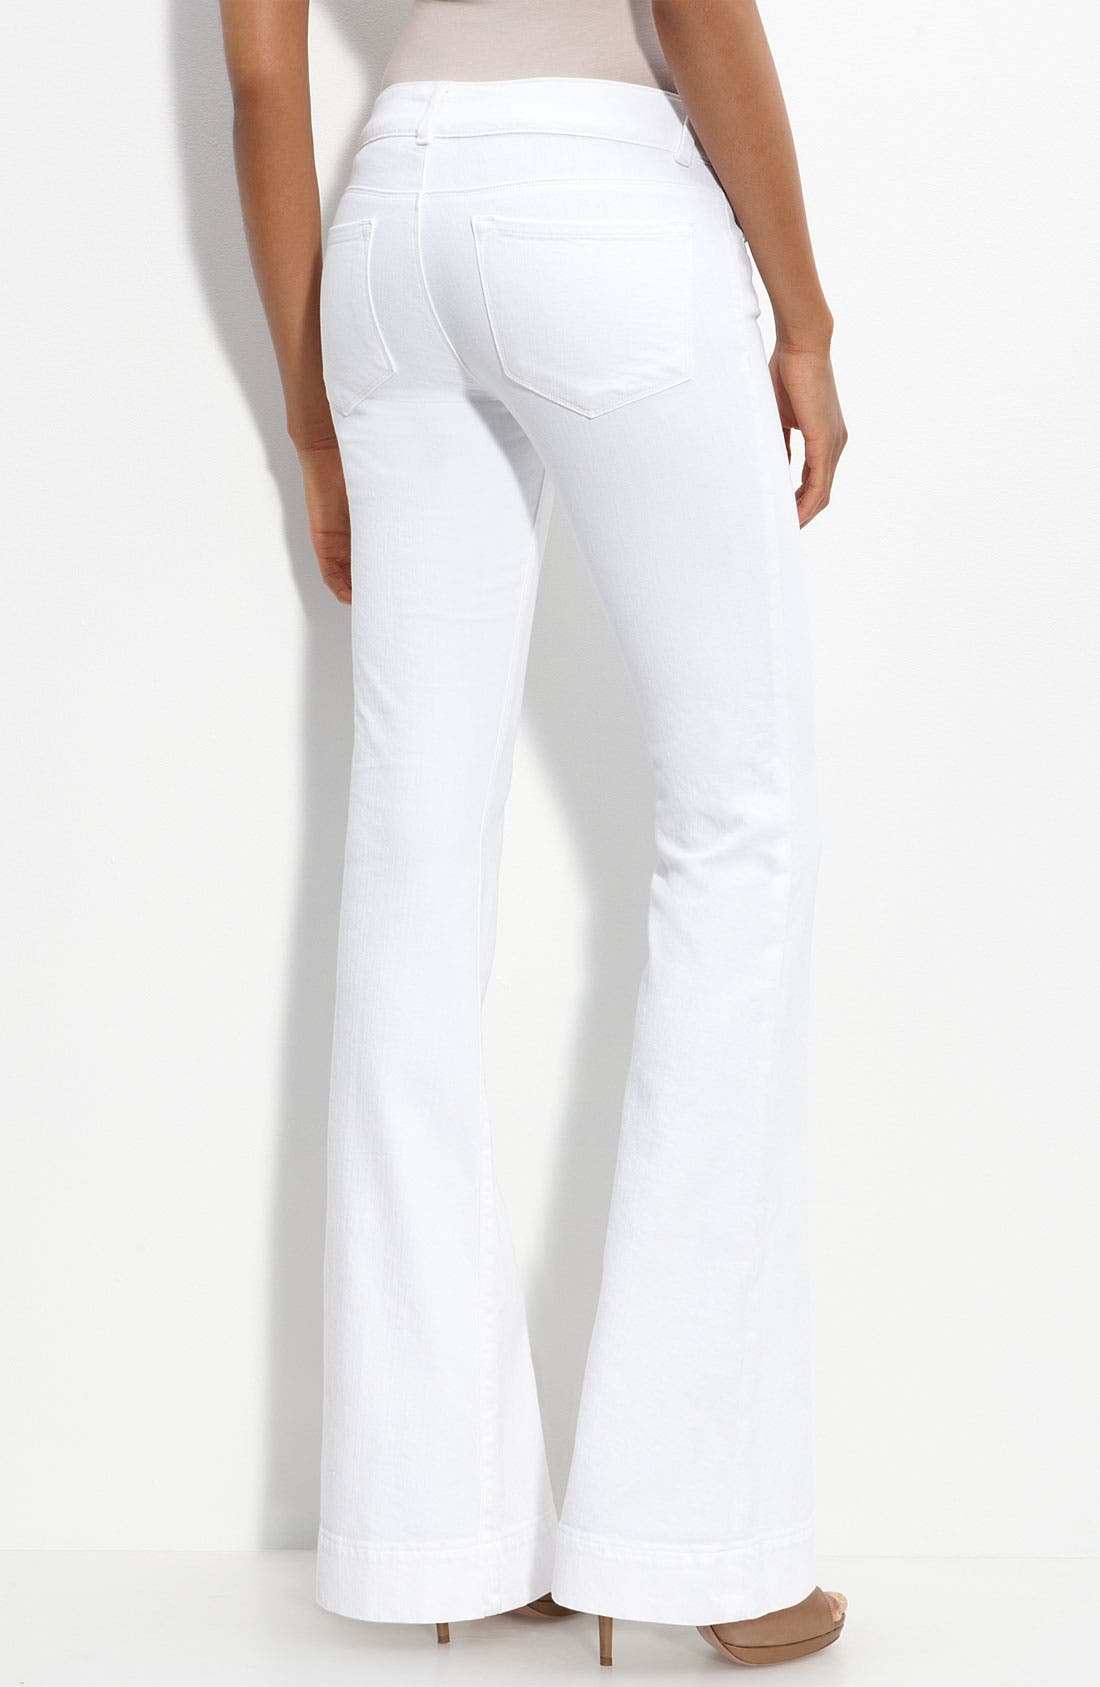 Alternate Image 1 Selected - J Brand 'Love Story' Flare Leg Stretch Jeans